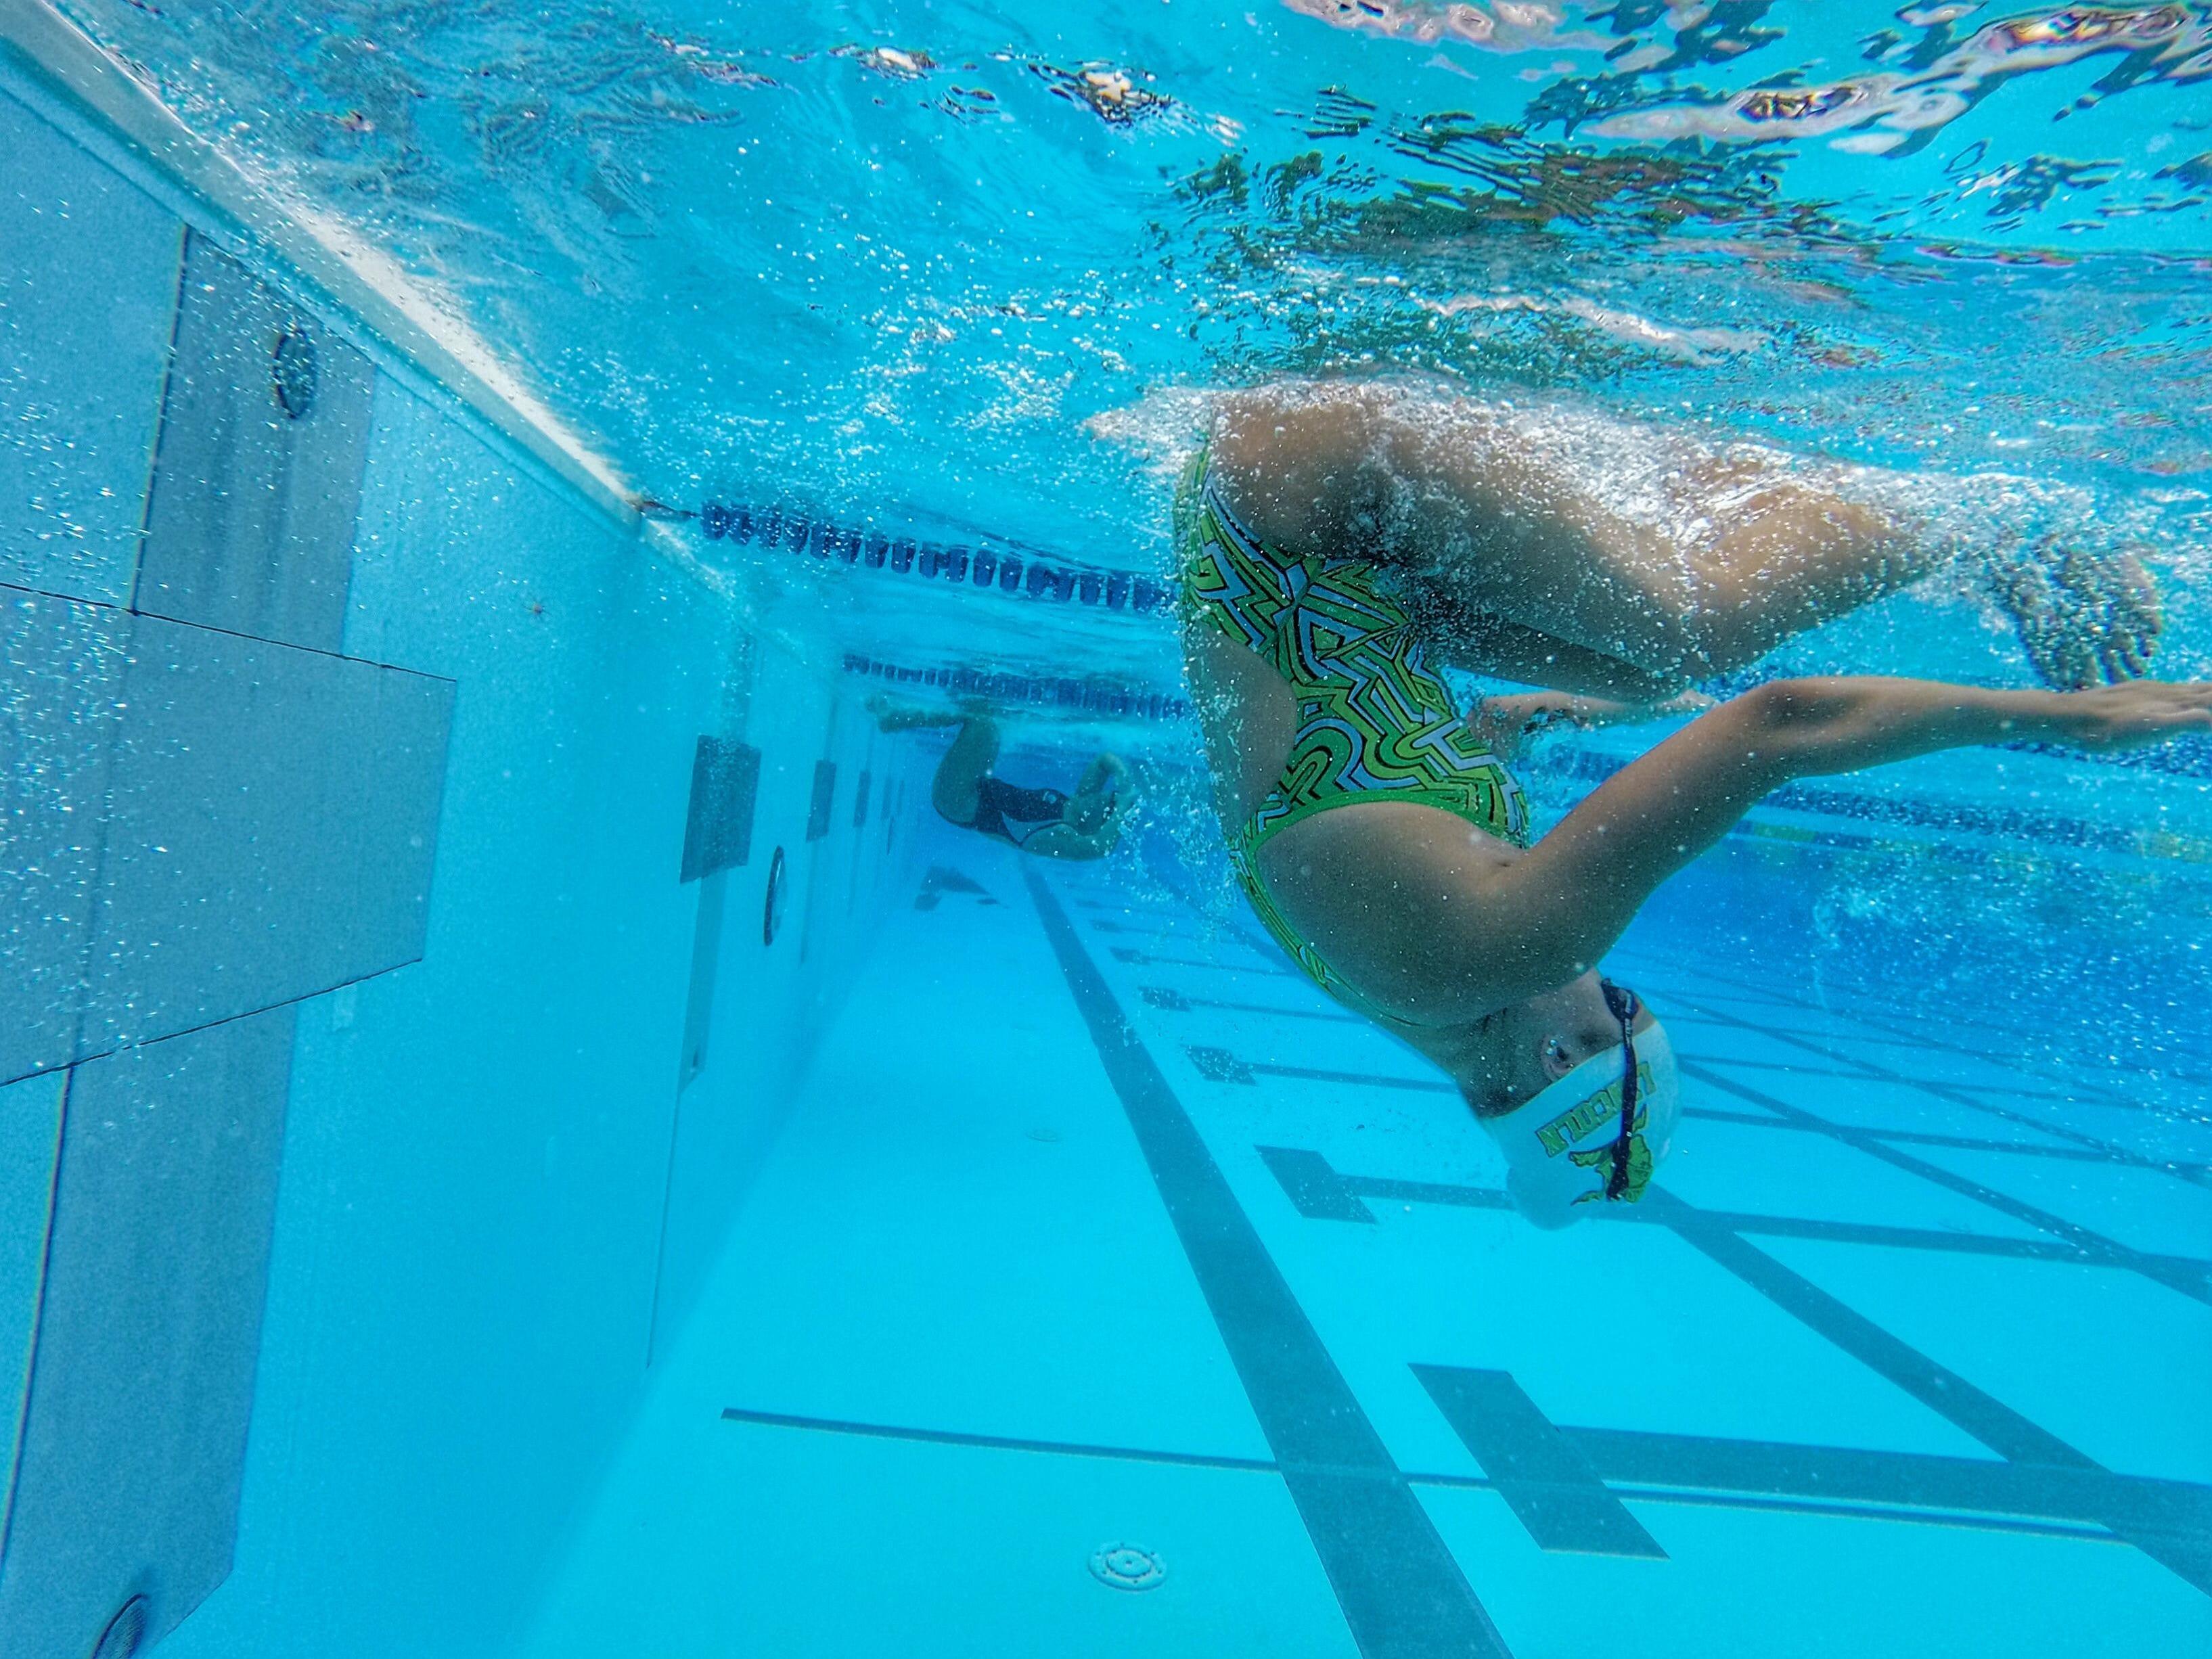 Lincoln junior Sara-Kellett Clark makes her flip while swimming practice laps at Trousdell Aquatic Center.